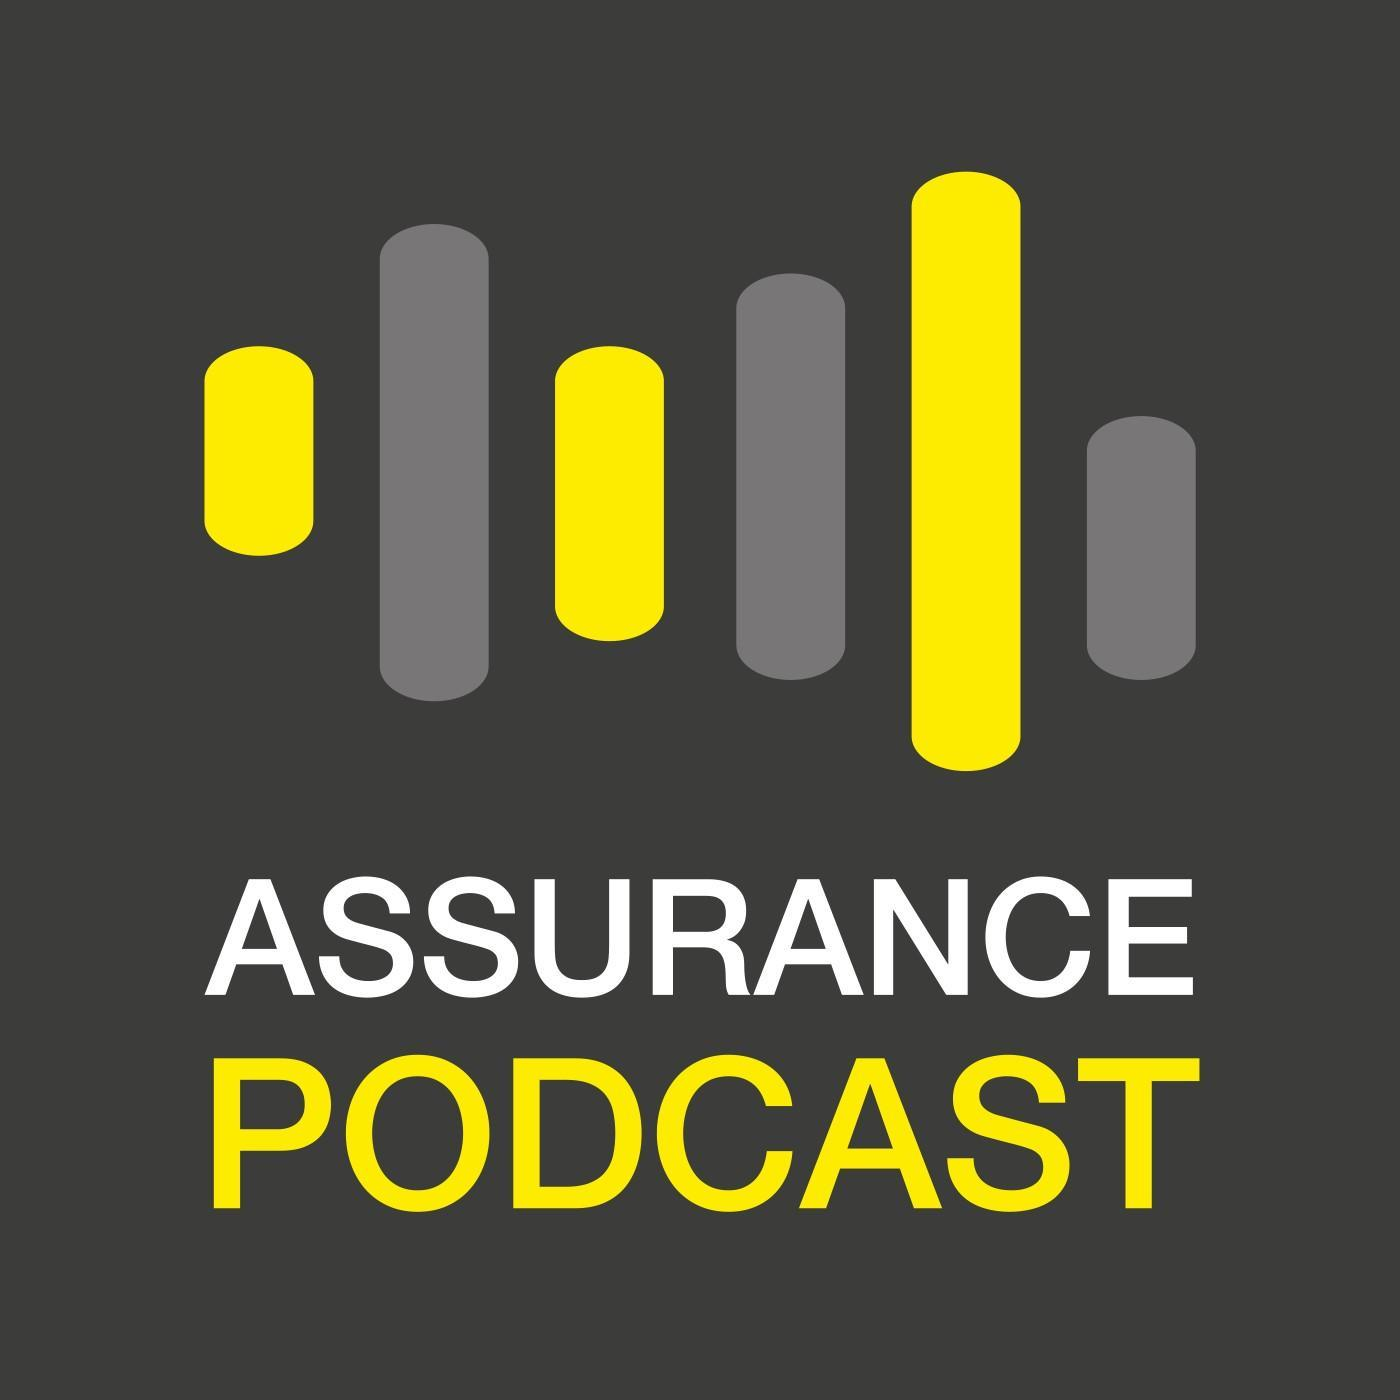 Assurance Podcast